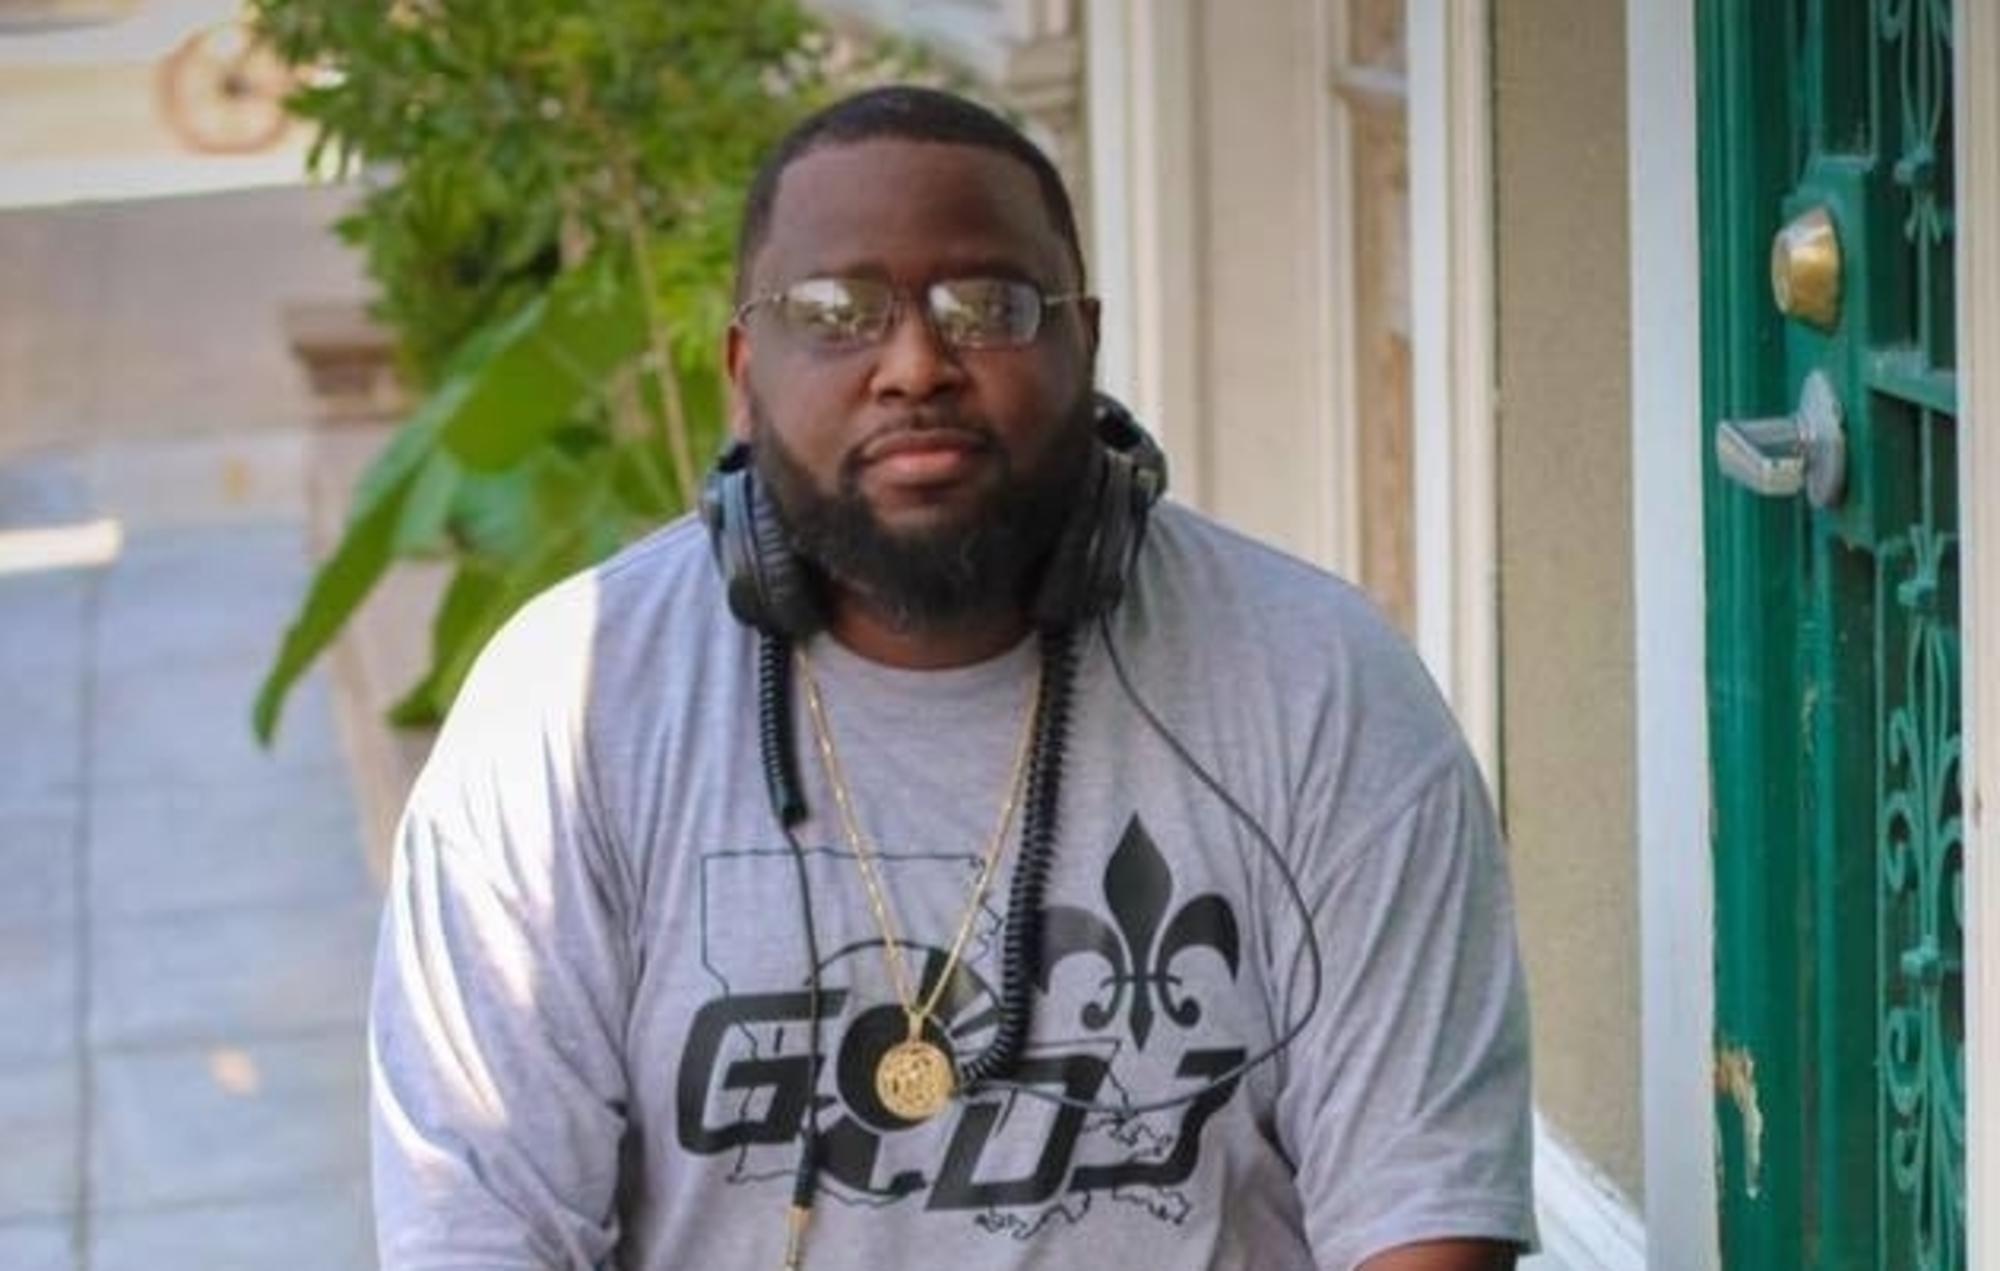 New Orleans DJ Black N Mild dies due to coronavirus - EpicNews